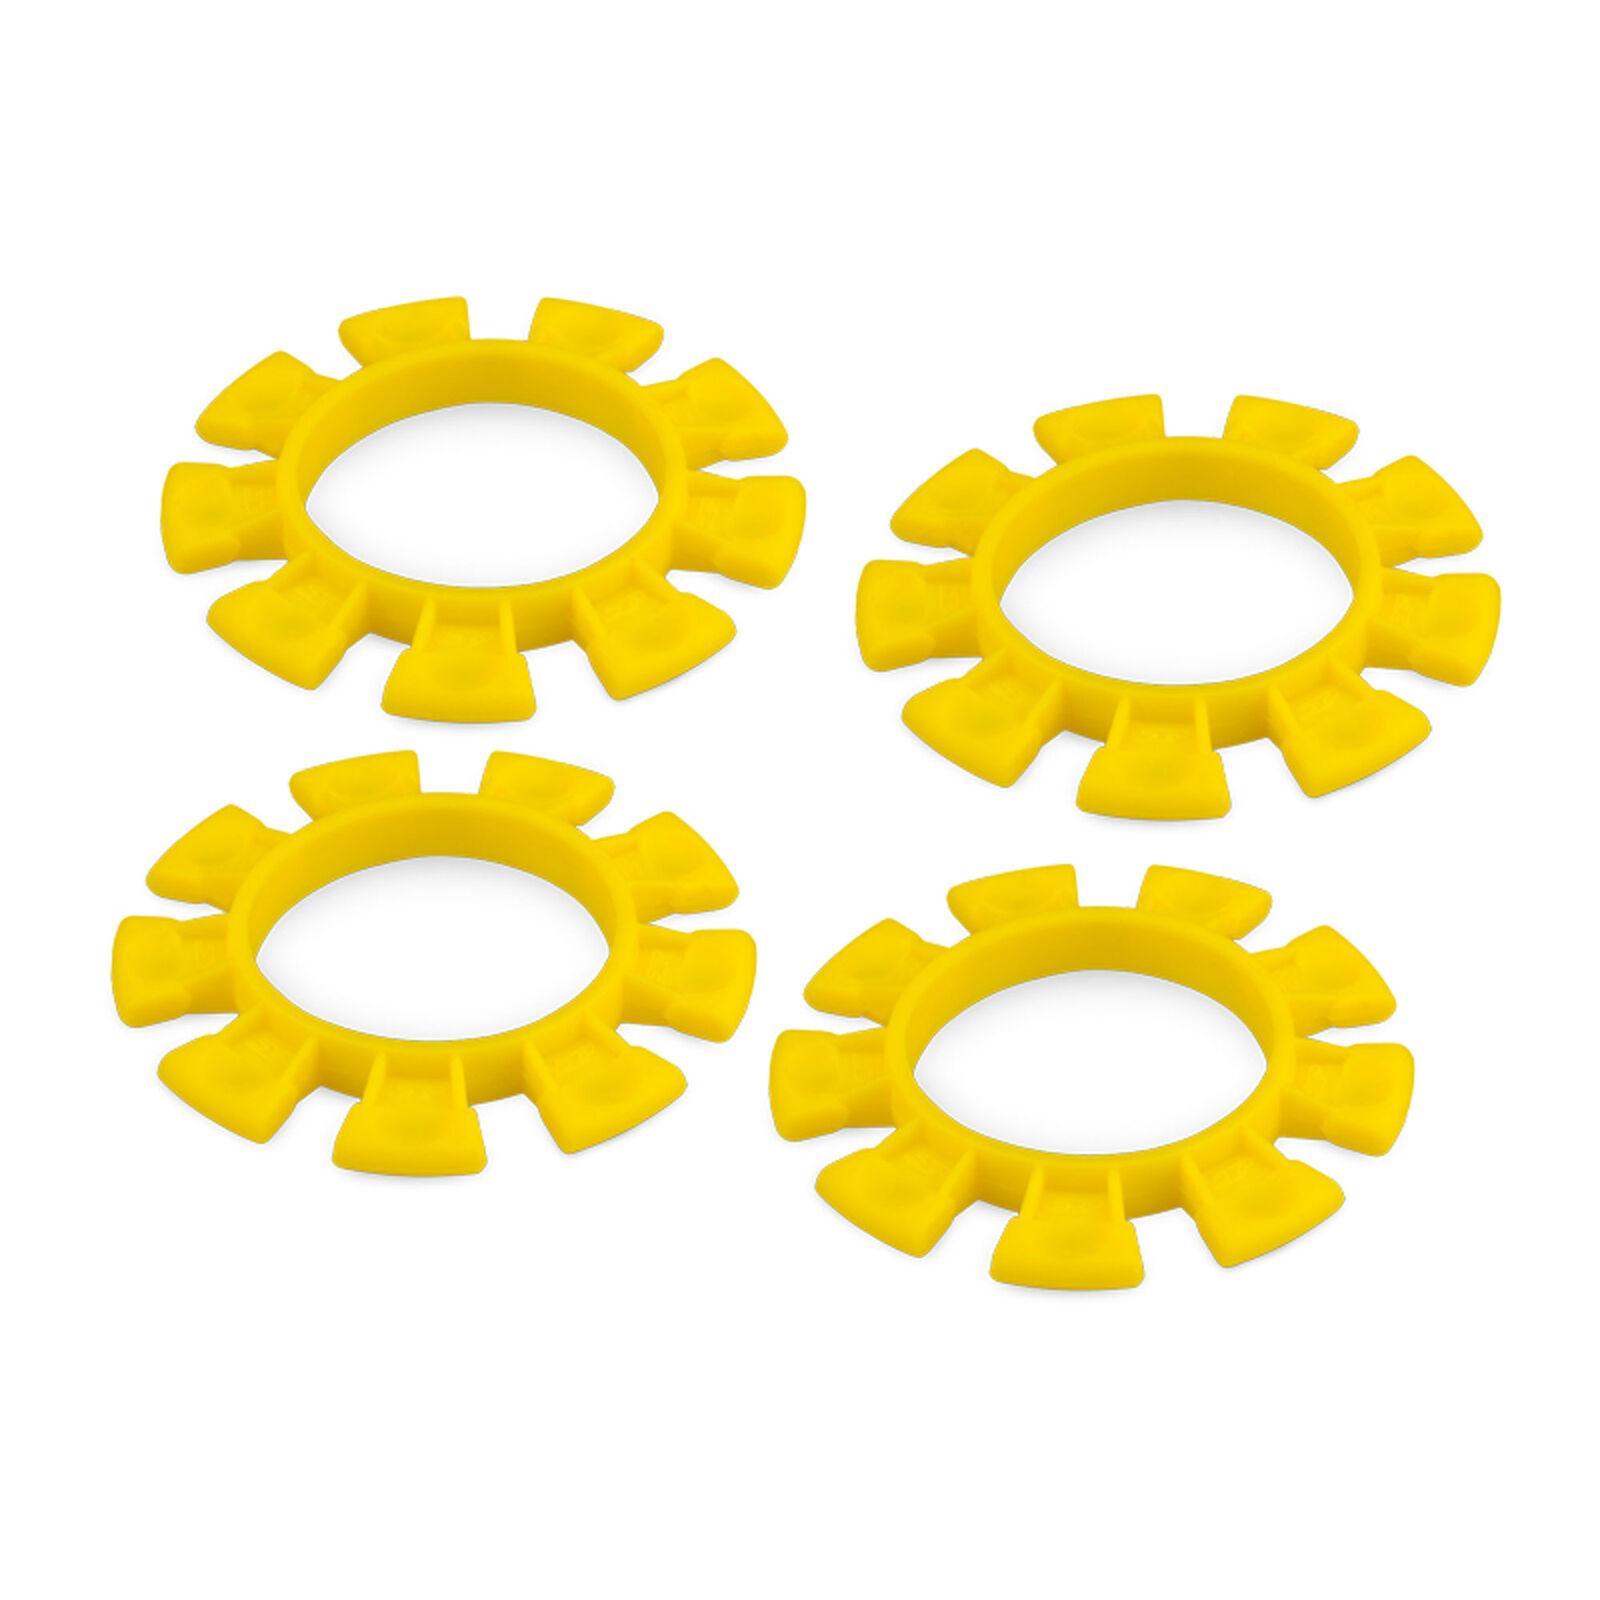 Dirt Bands Tire Gluing Rubber Bands Yellow (4)